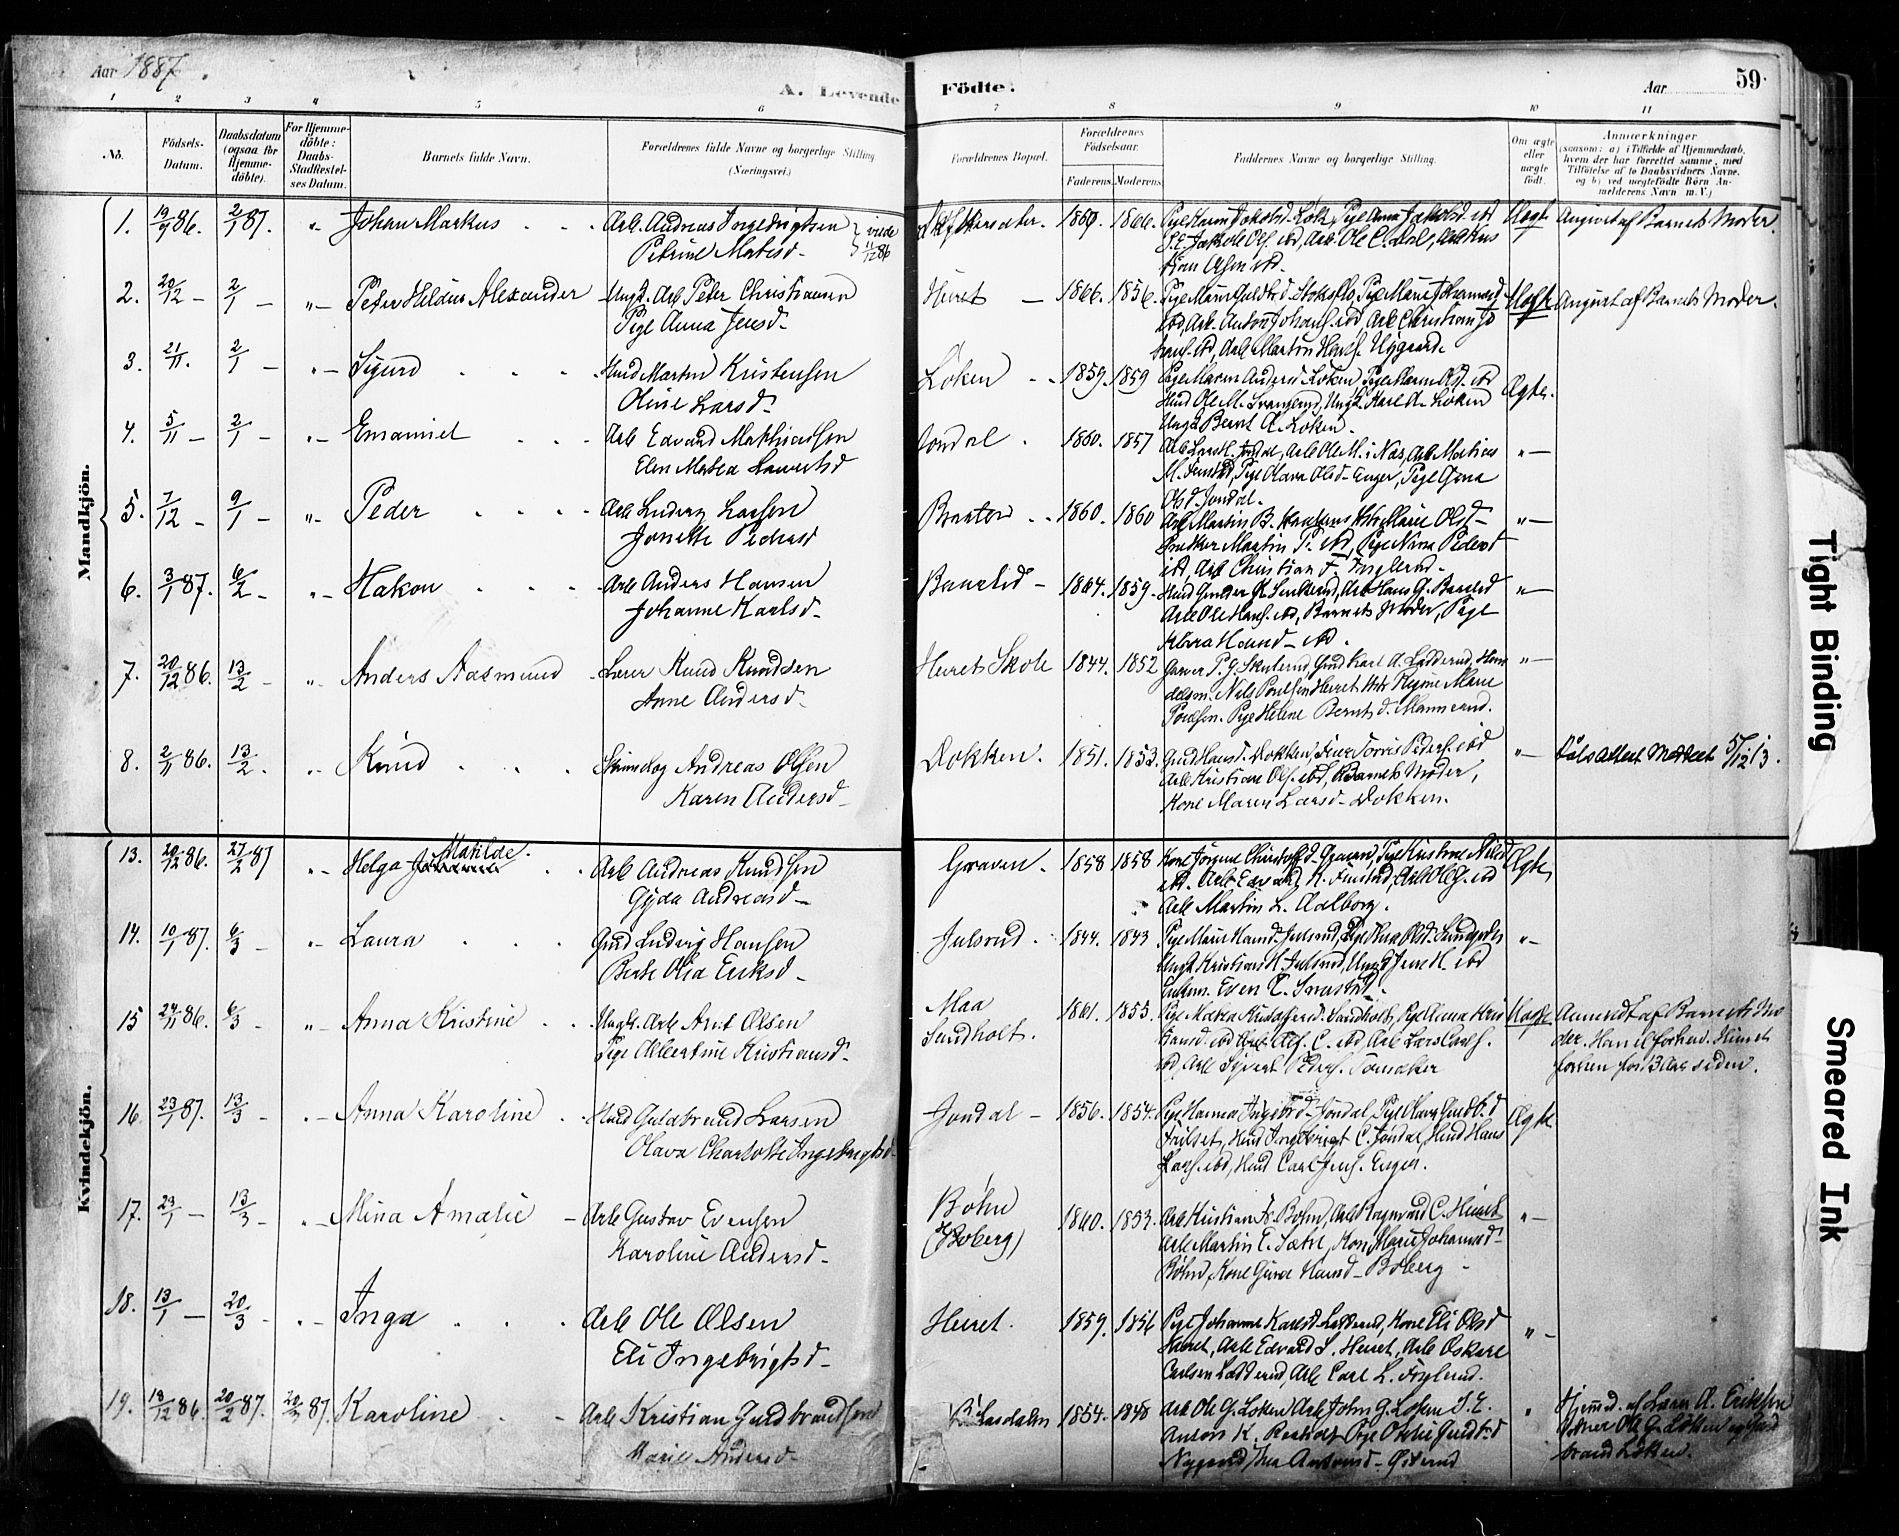 SAO, Eidsvoll prestekontor Kirkebøker, F/Fa/L0002: Ministerialbok nr. I 2, 1882-1895, s. 59